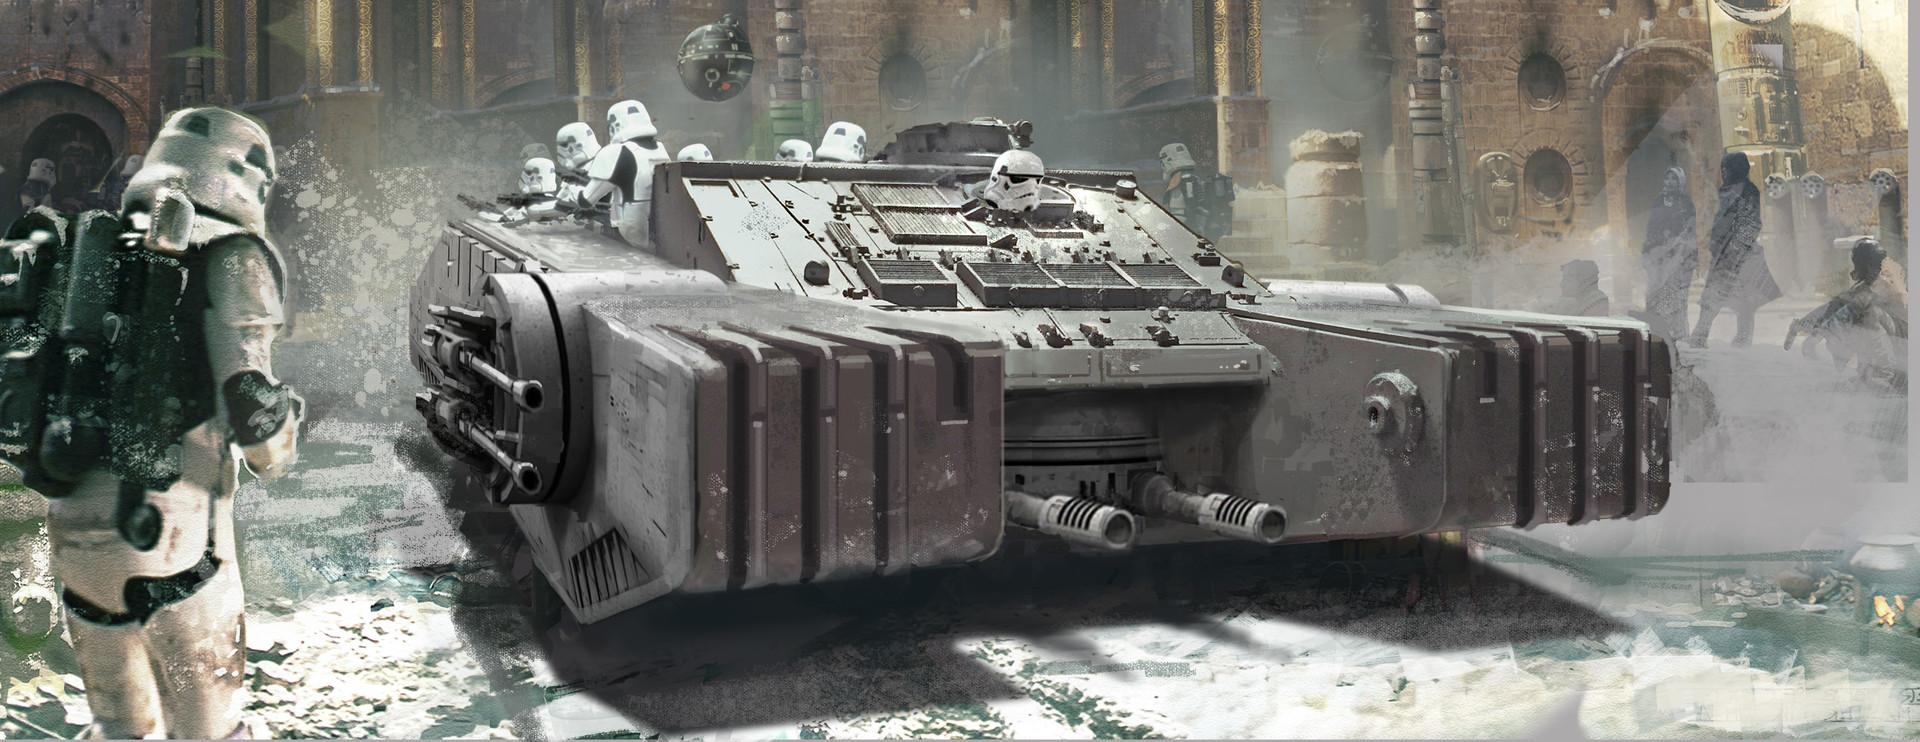 vincent-jenkins-3155-veh-communisthoverc